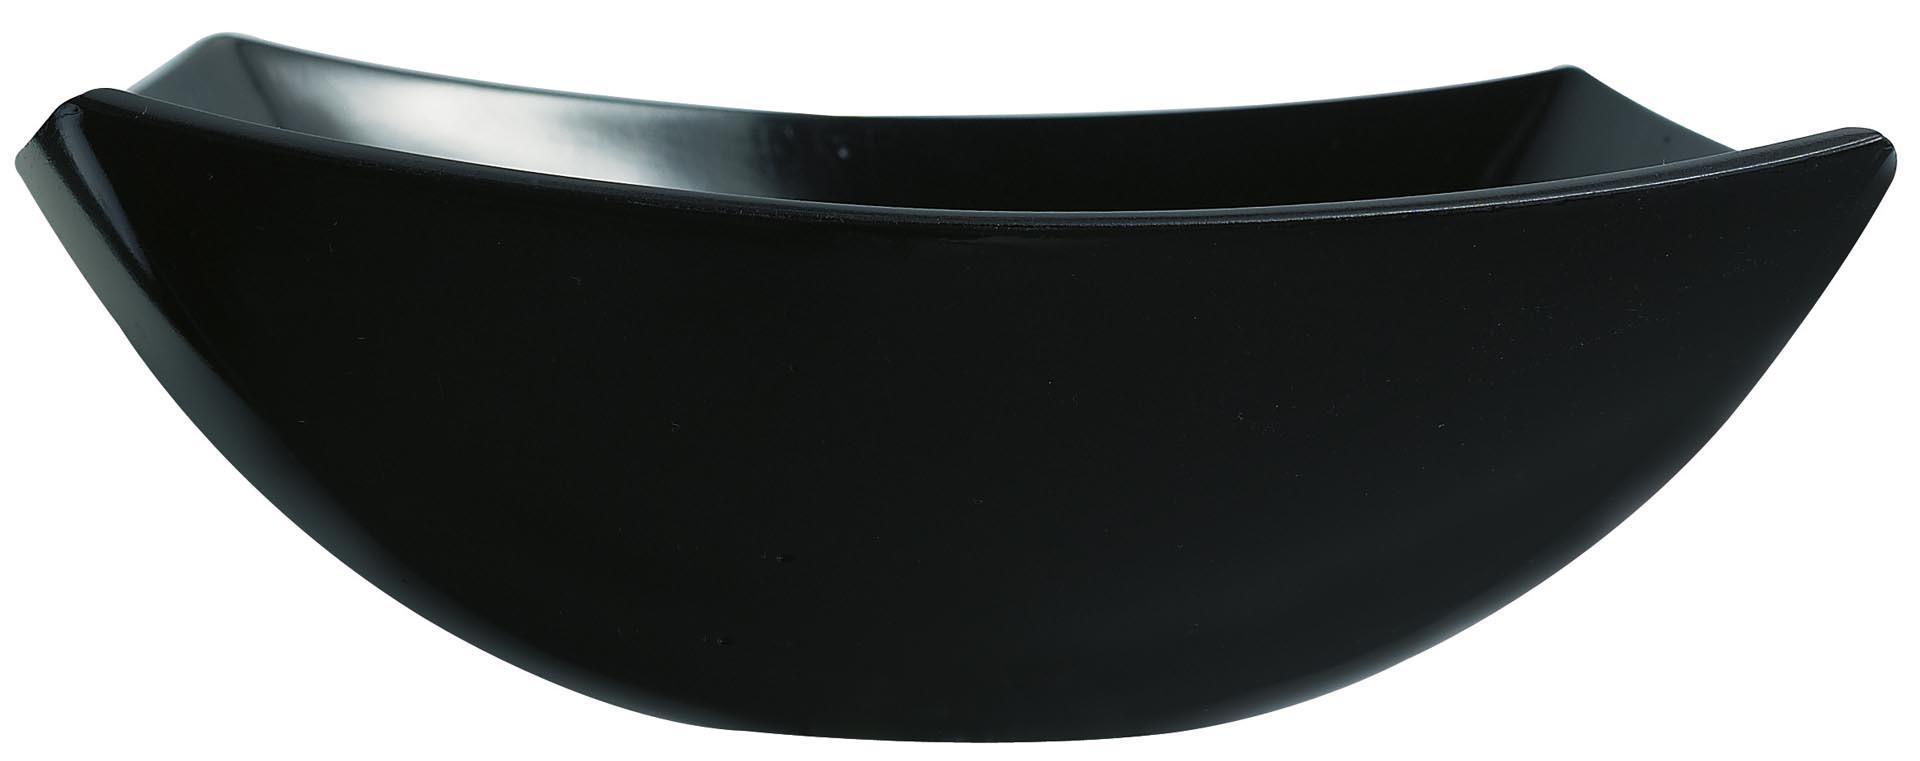 "Hartglas-Schale ""Quadrato"" schwarz 24 x 24 cm"